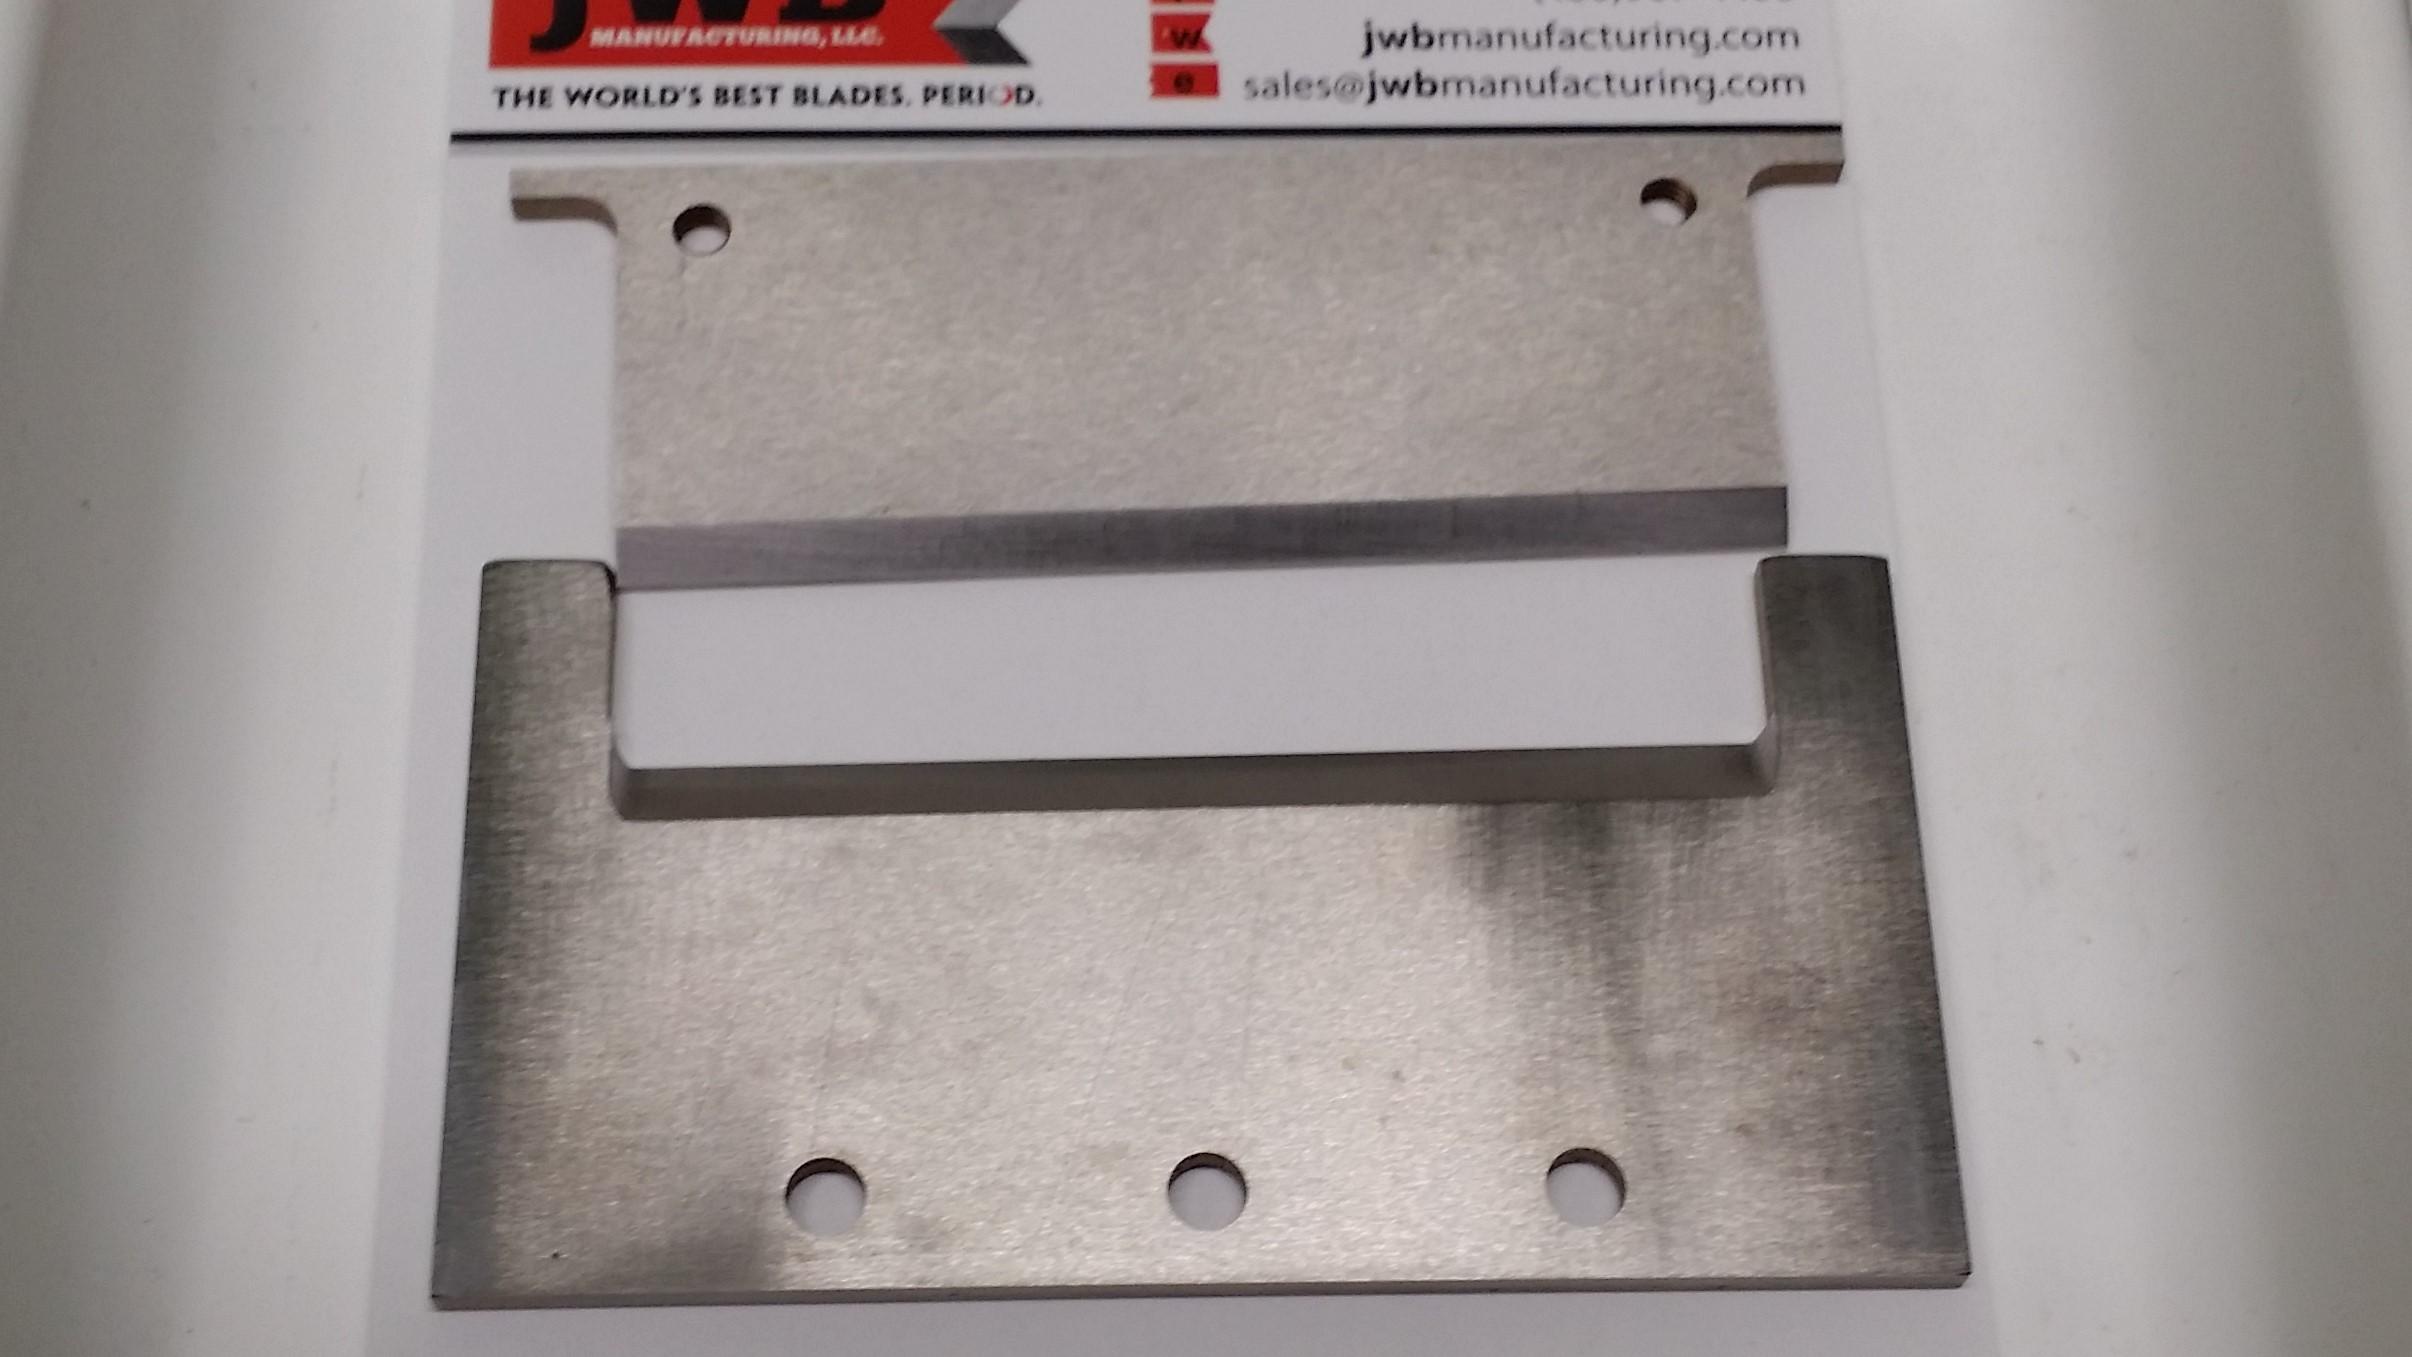 Eubanks 4600 Blade Set (1 anvil/1 blade